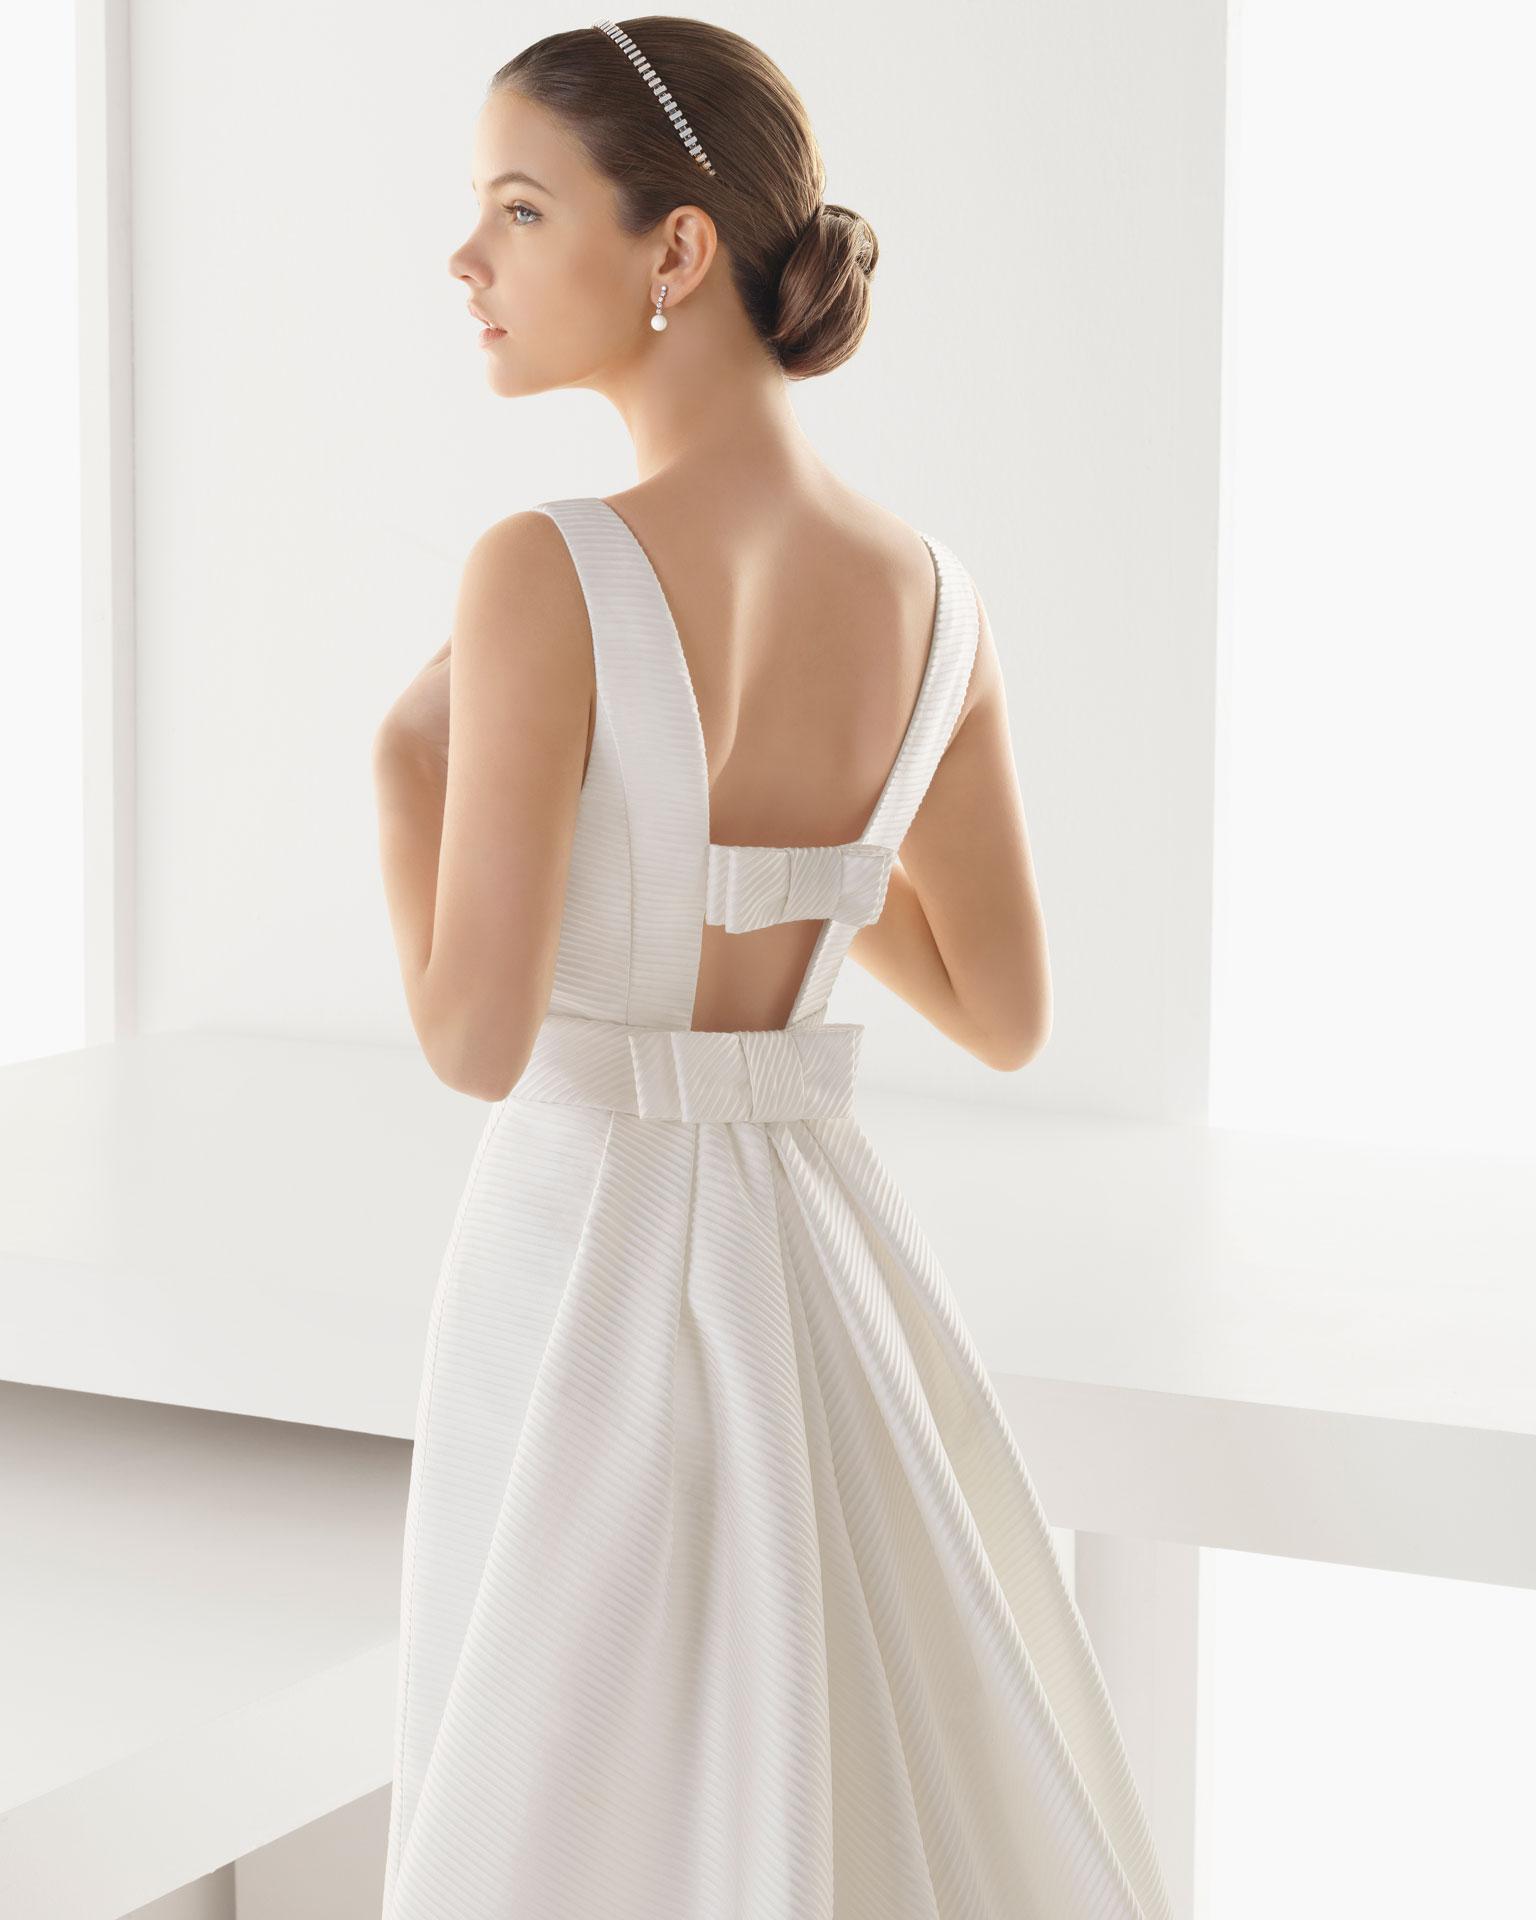 rosa clara 2013 spring bridal collection the fashionbrides. Black Bedroom Furniture Sets. Home Design Ideas